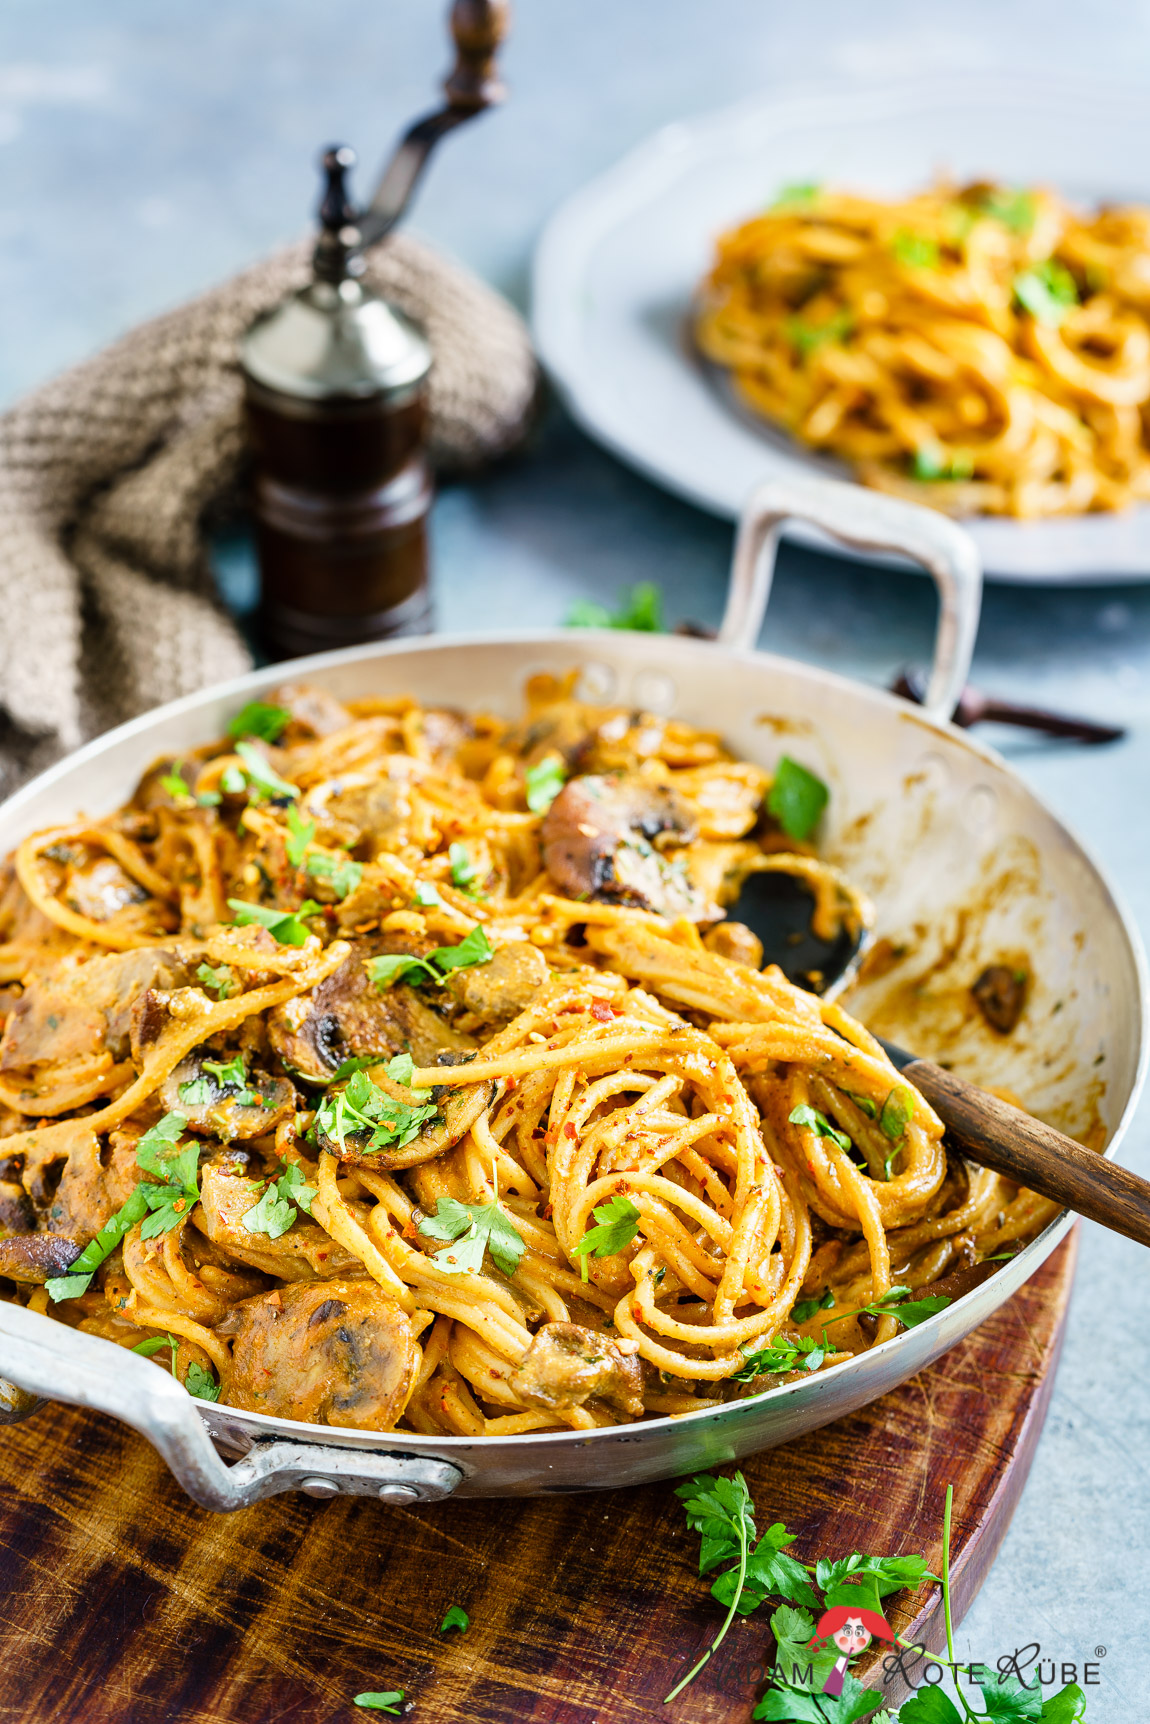 Madam Rote Rübe - Spaghetti in rauchiger Pilzrahm-Sauce